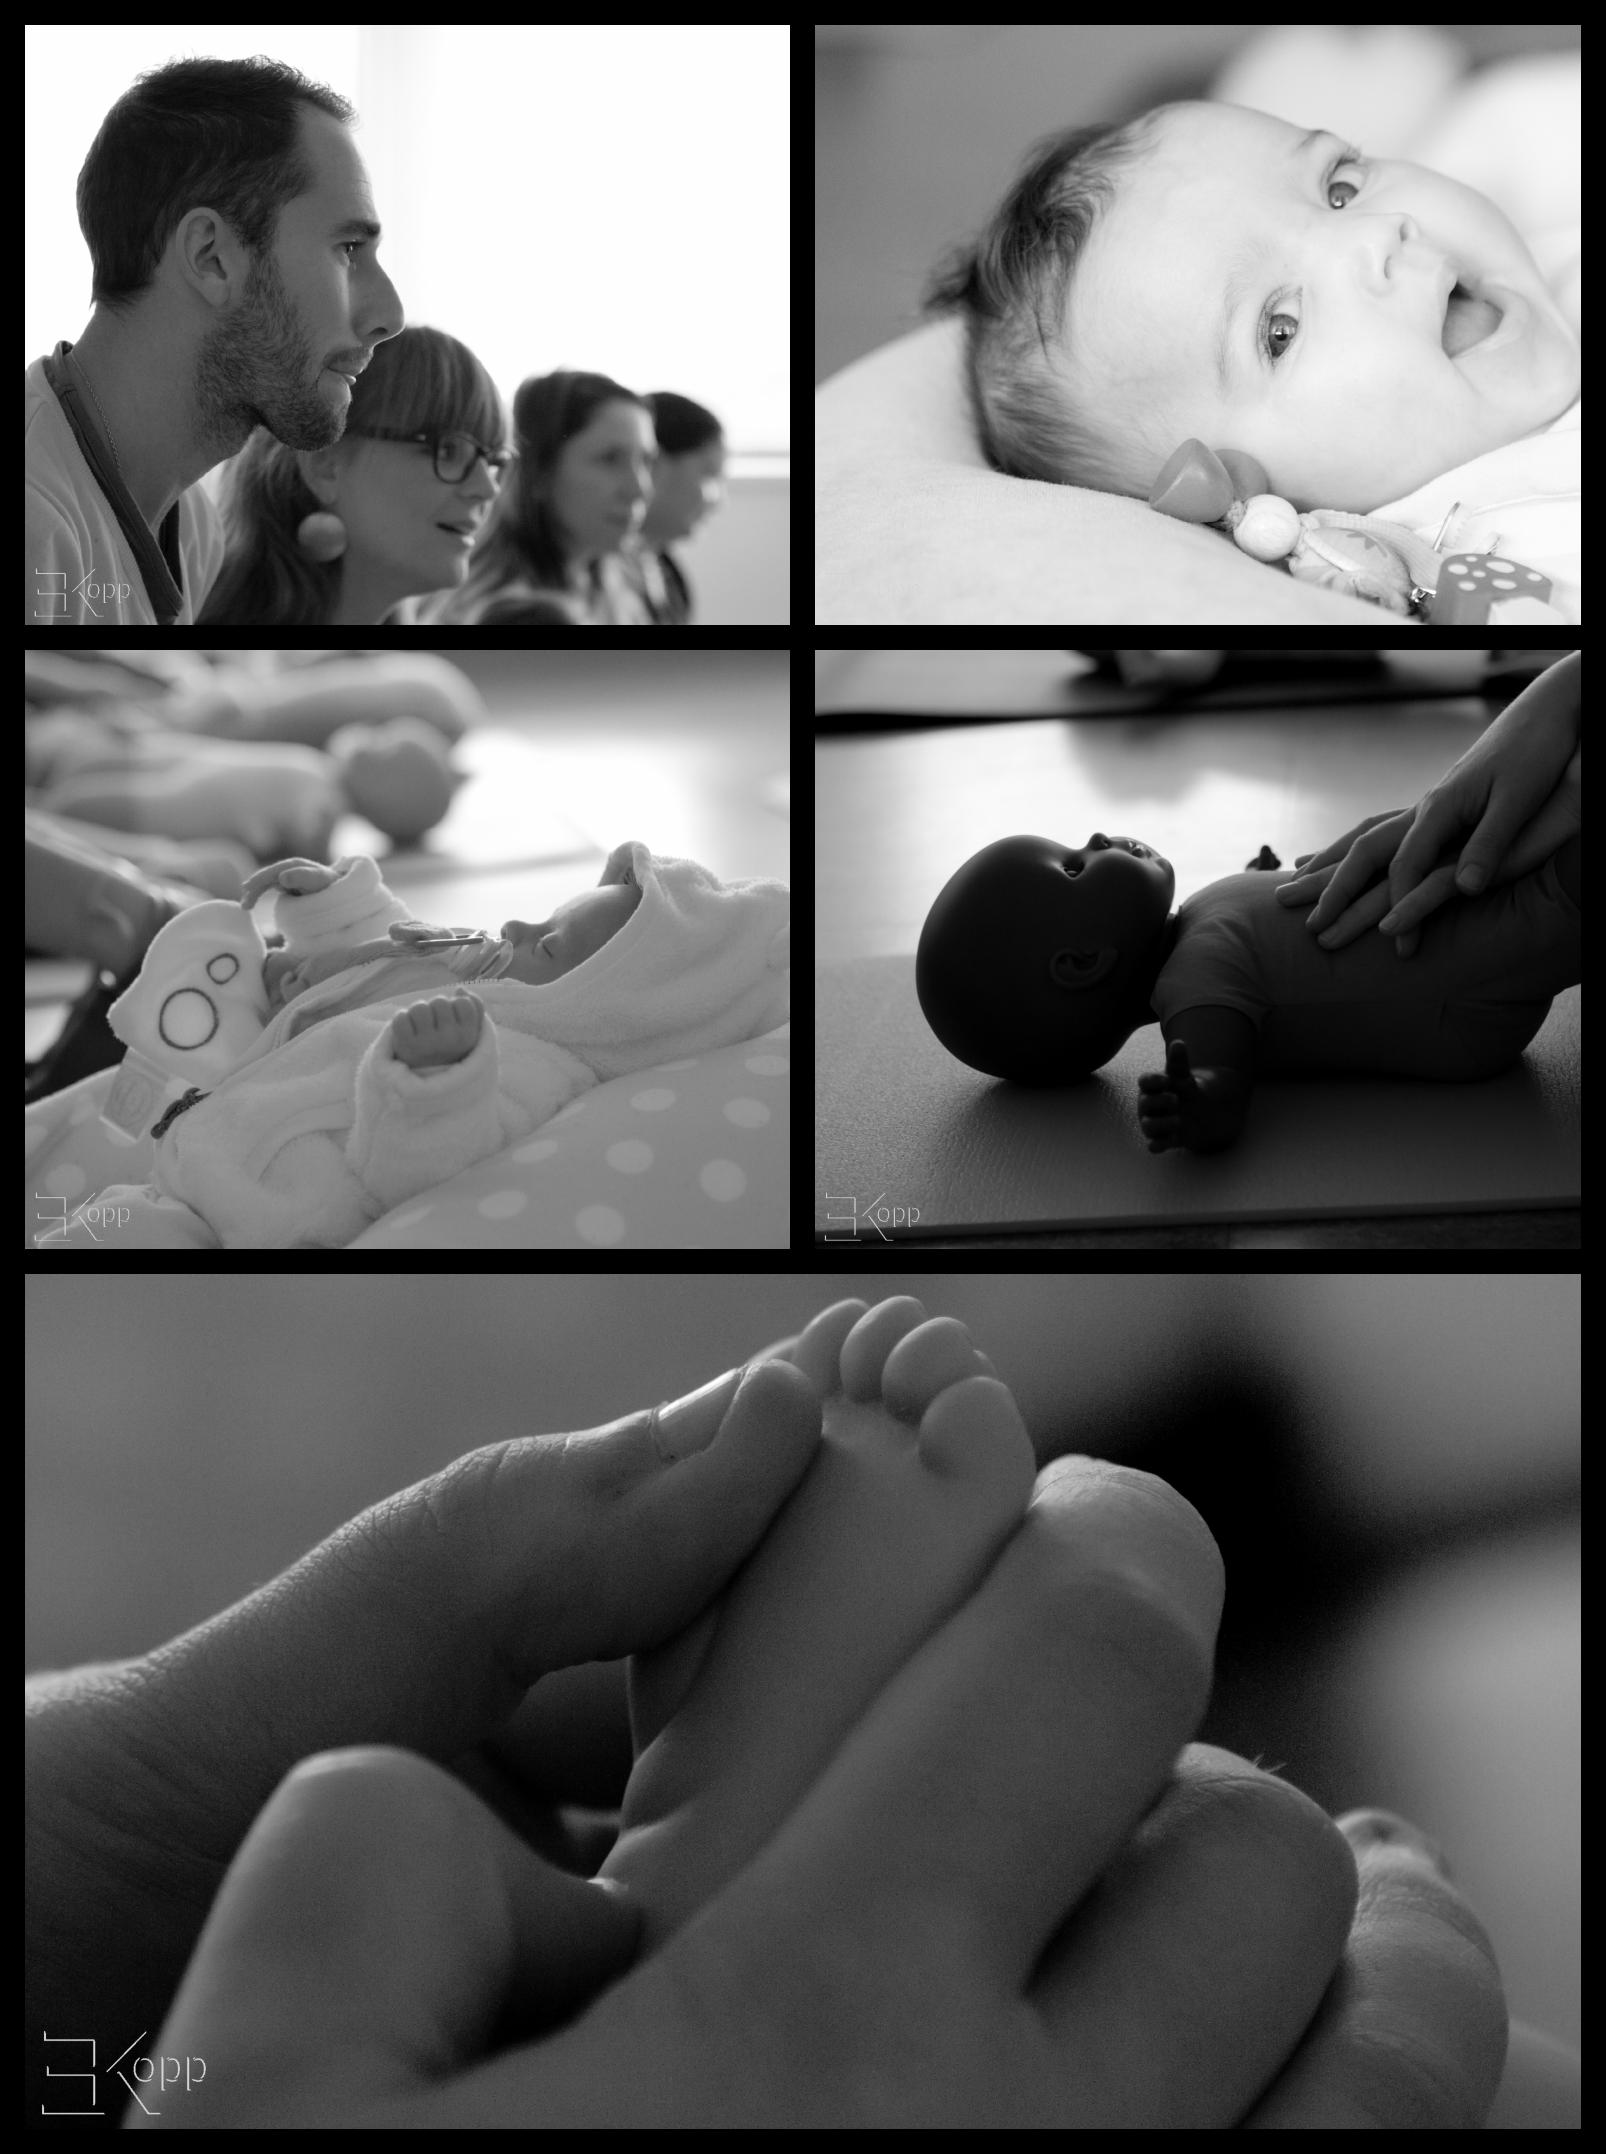 PicMonkey Collage (8)